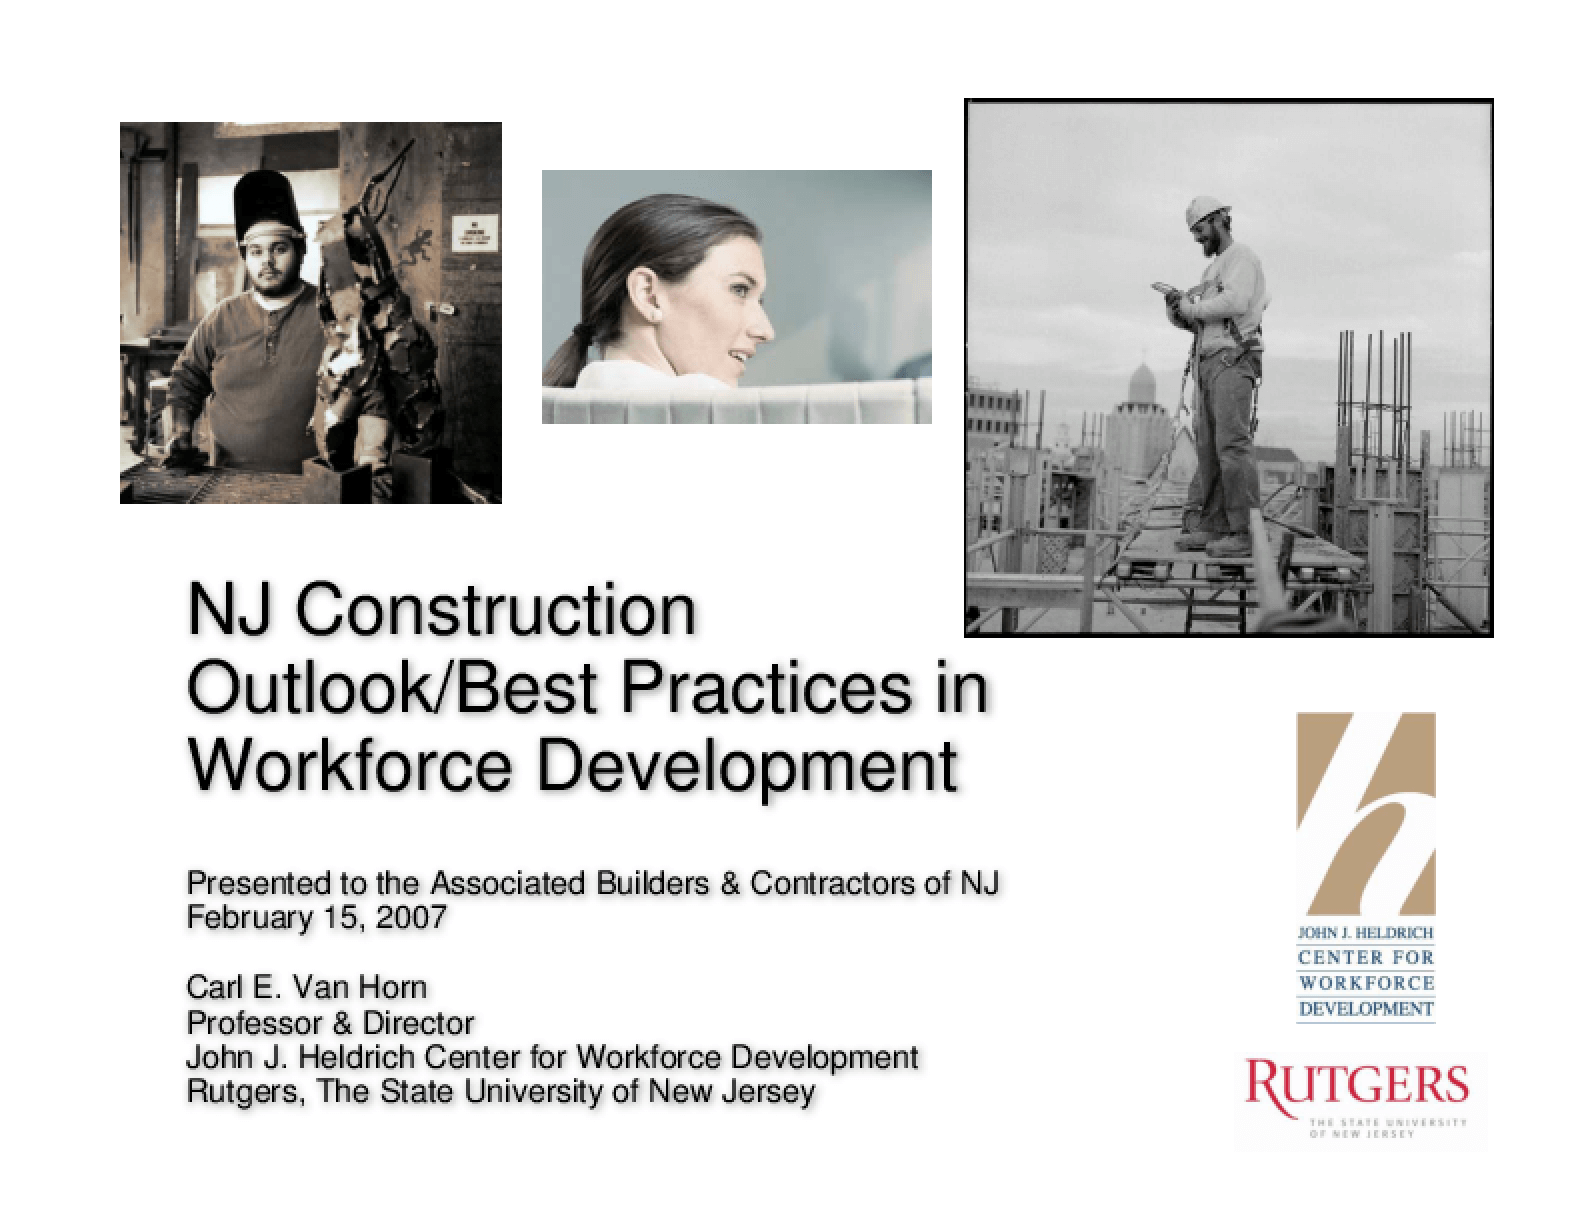 New Jersey Construction-Outlook/Best Practices in Workforce Development